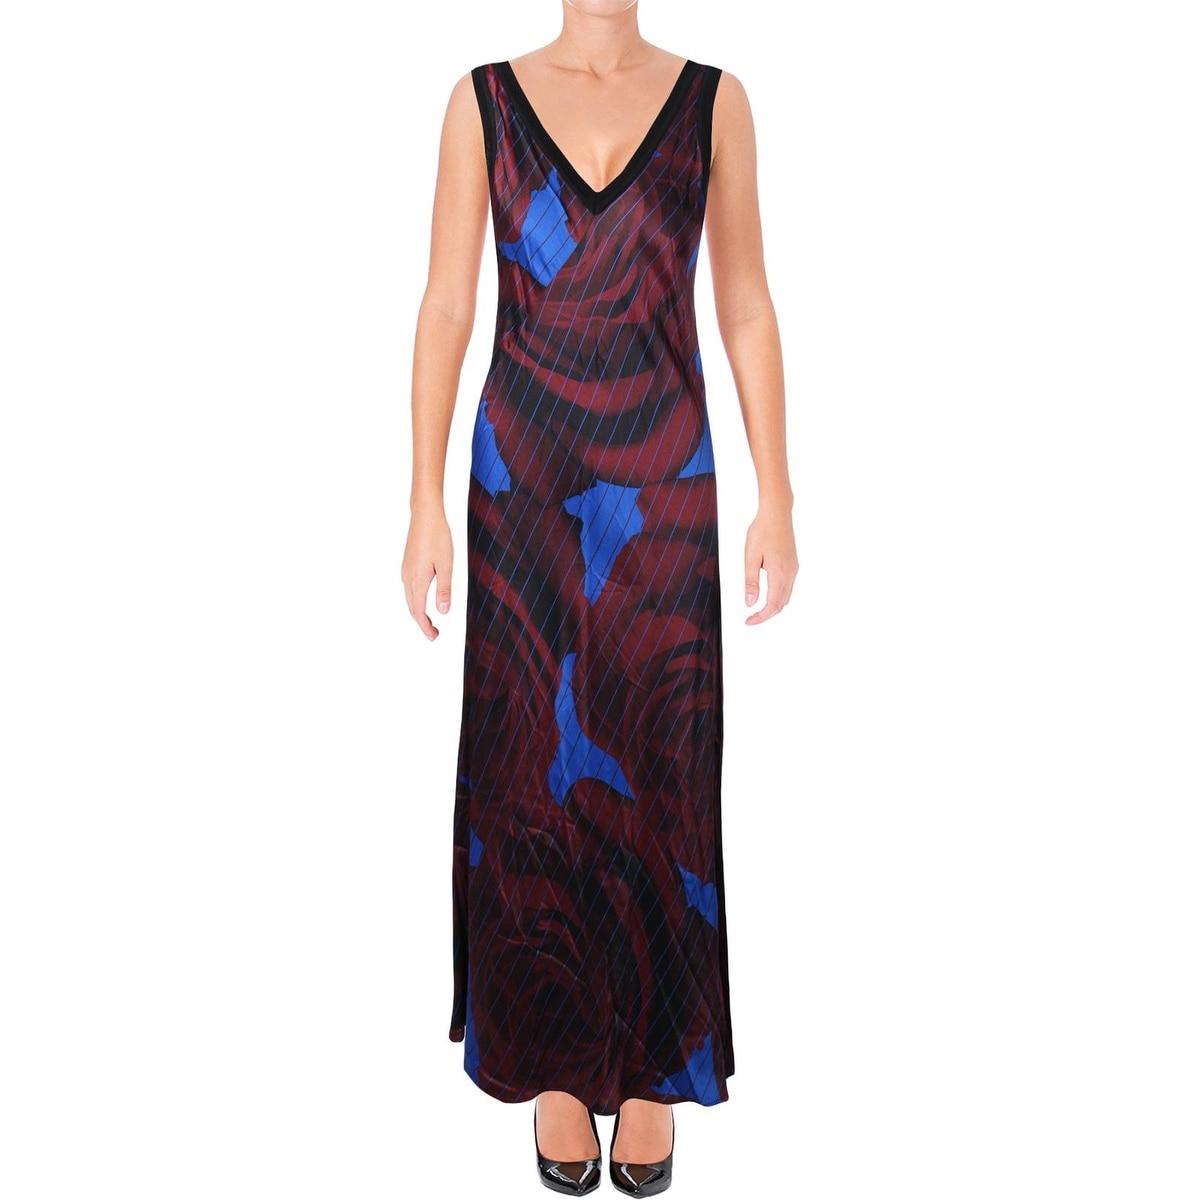 abd4f0ed7f Shop DKNY Womens Maxi Dress Merino Wool Striped - p - Free Shipping Today -  Overstock - 20599259